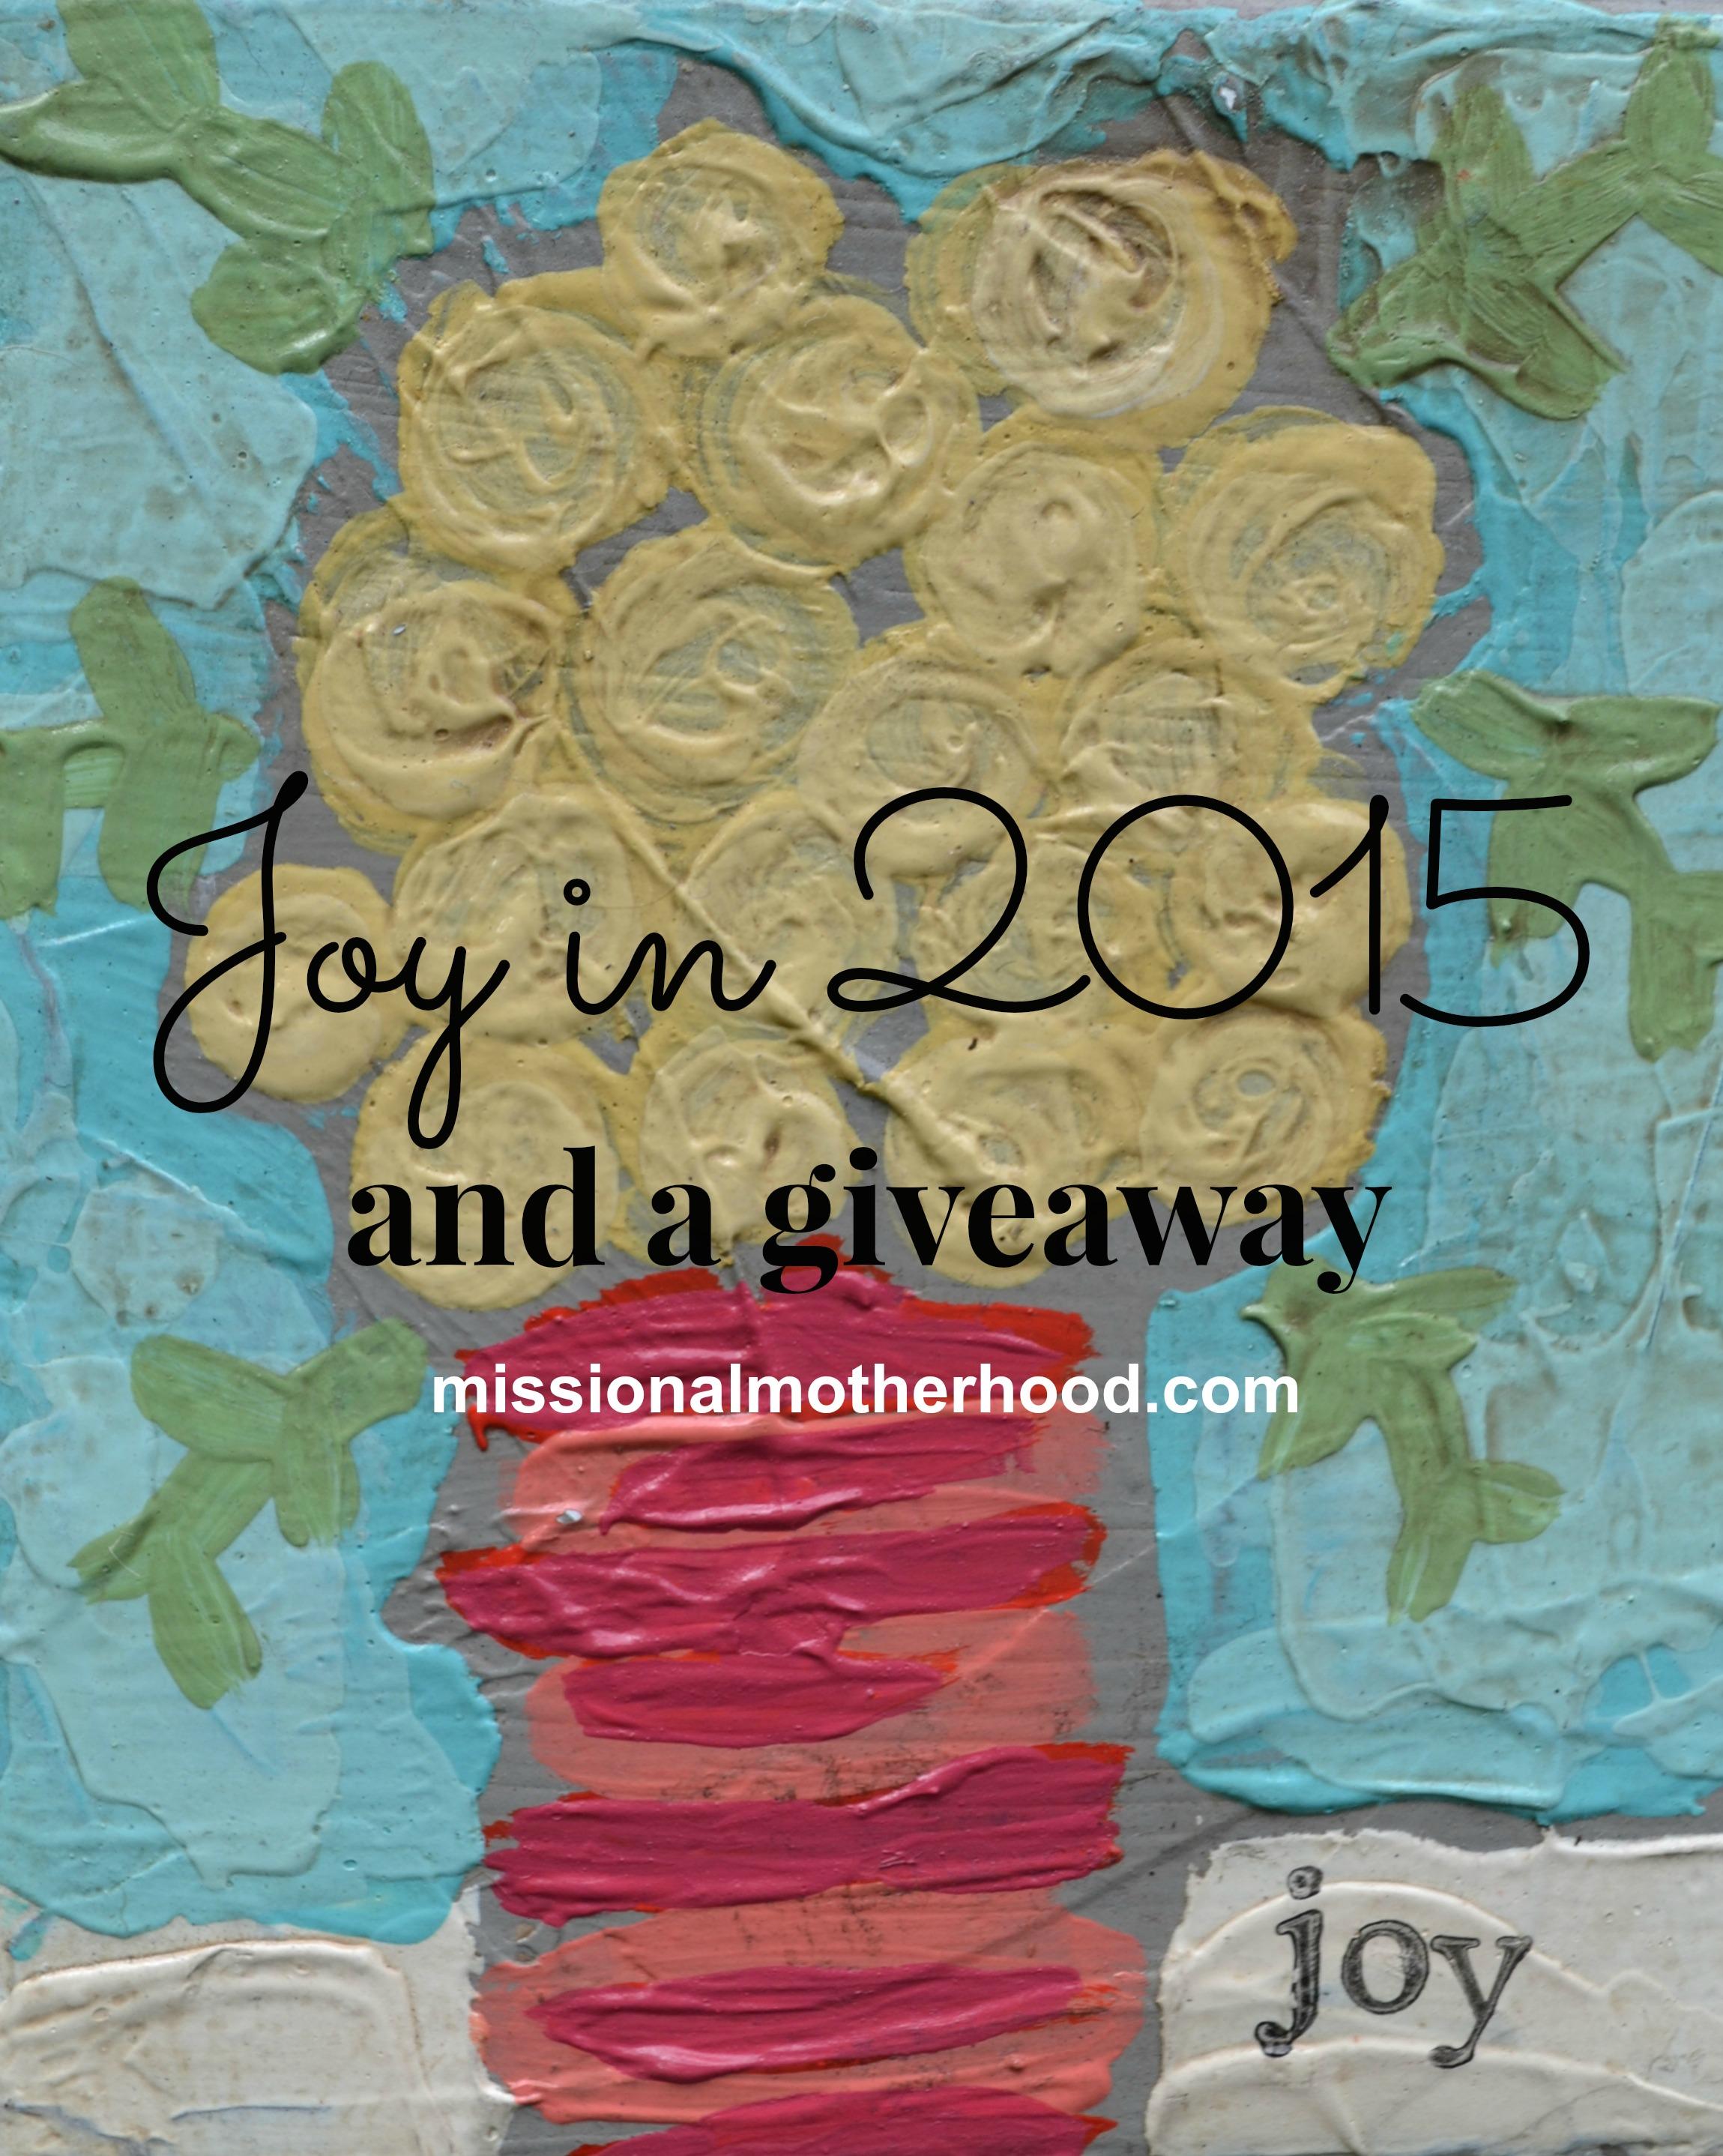 Joy in 2015